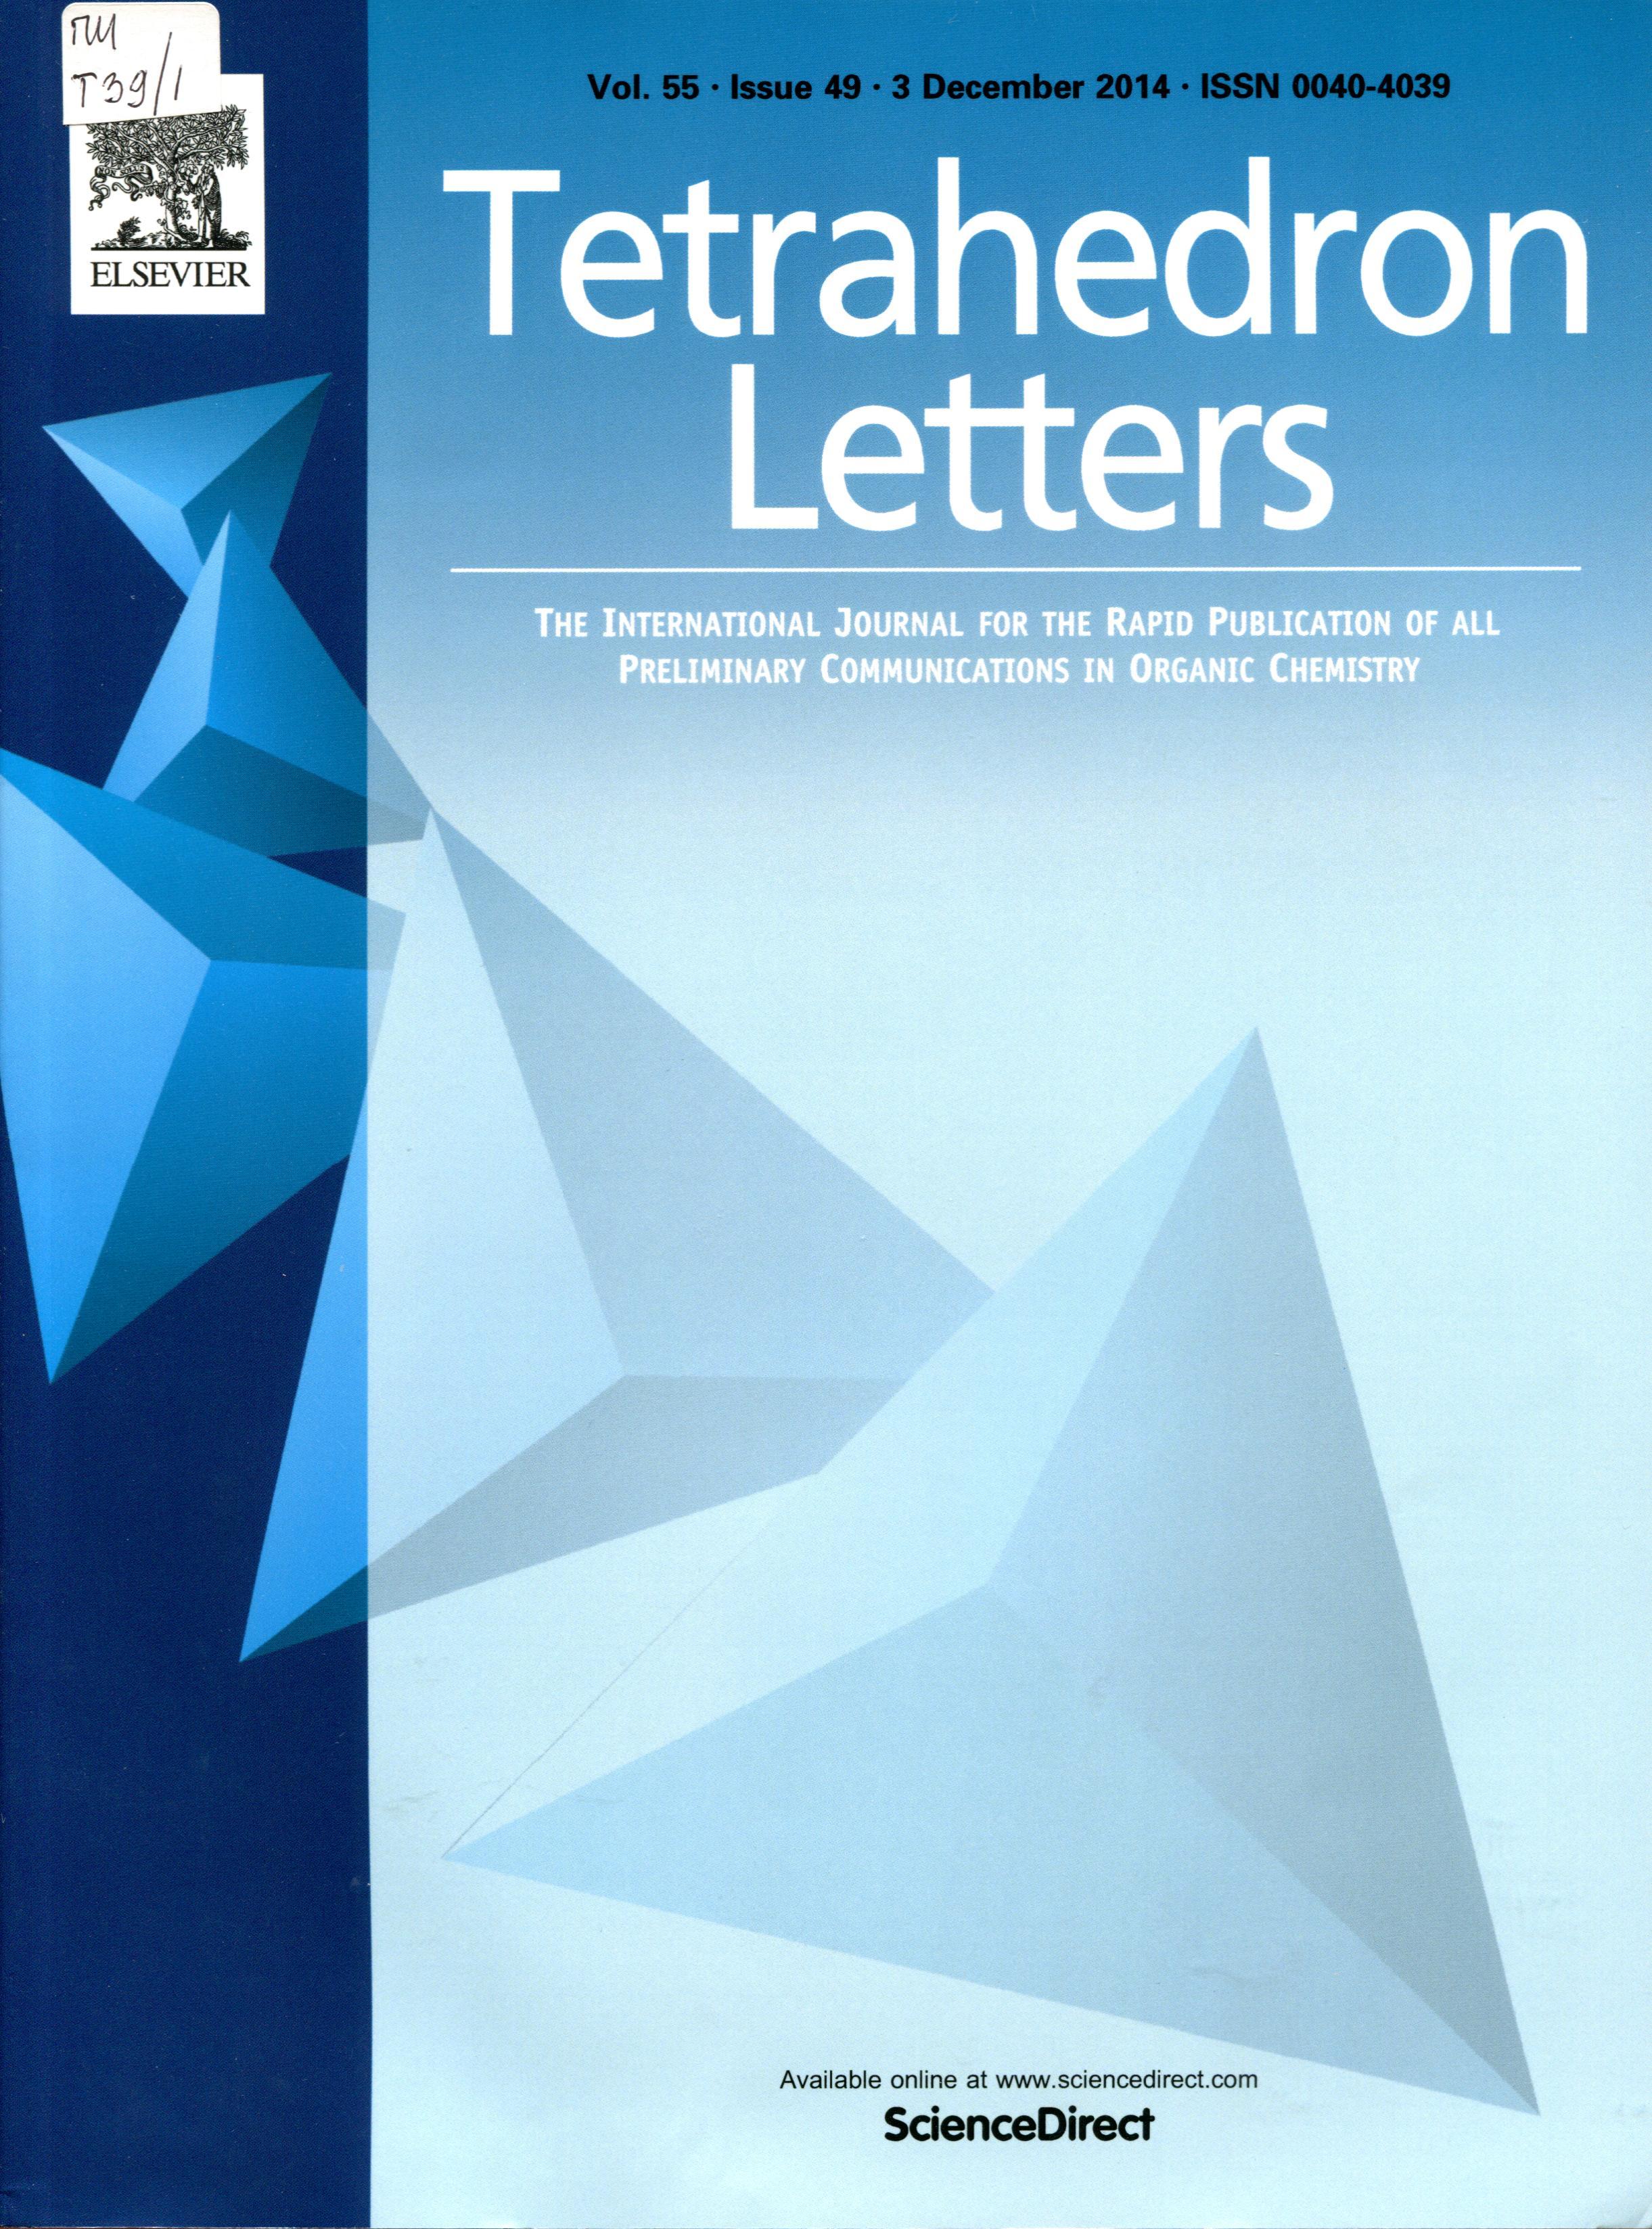 cover letter scientific journal elsevier